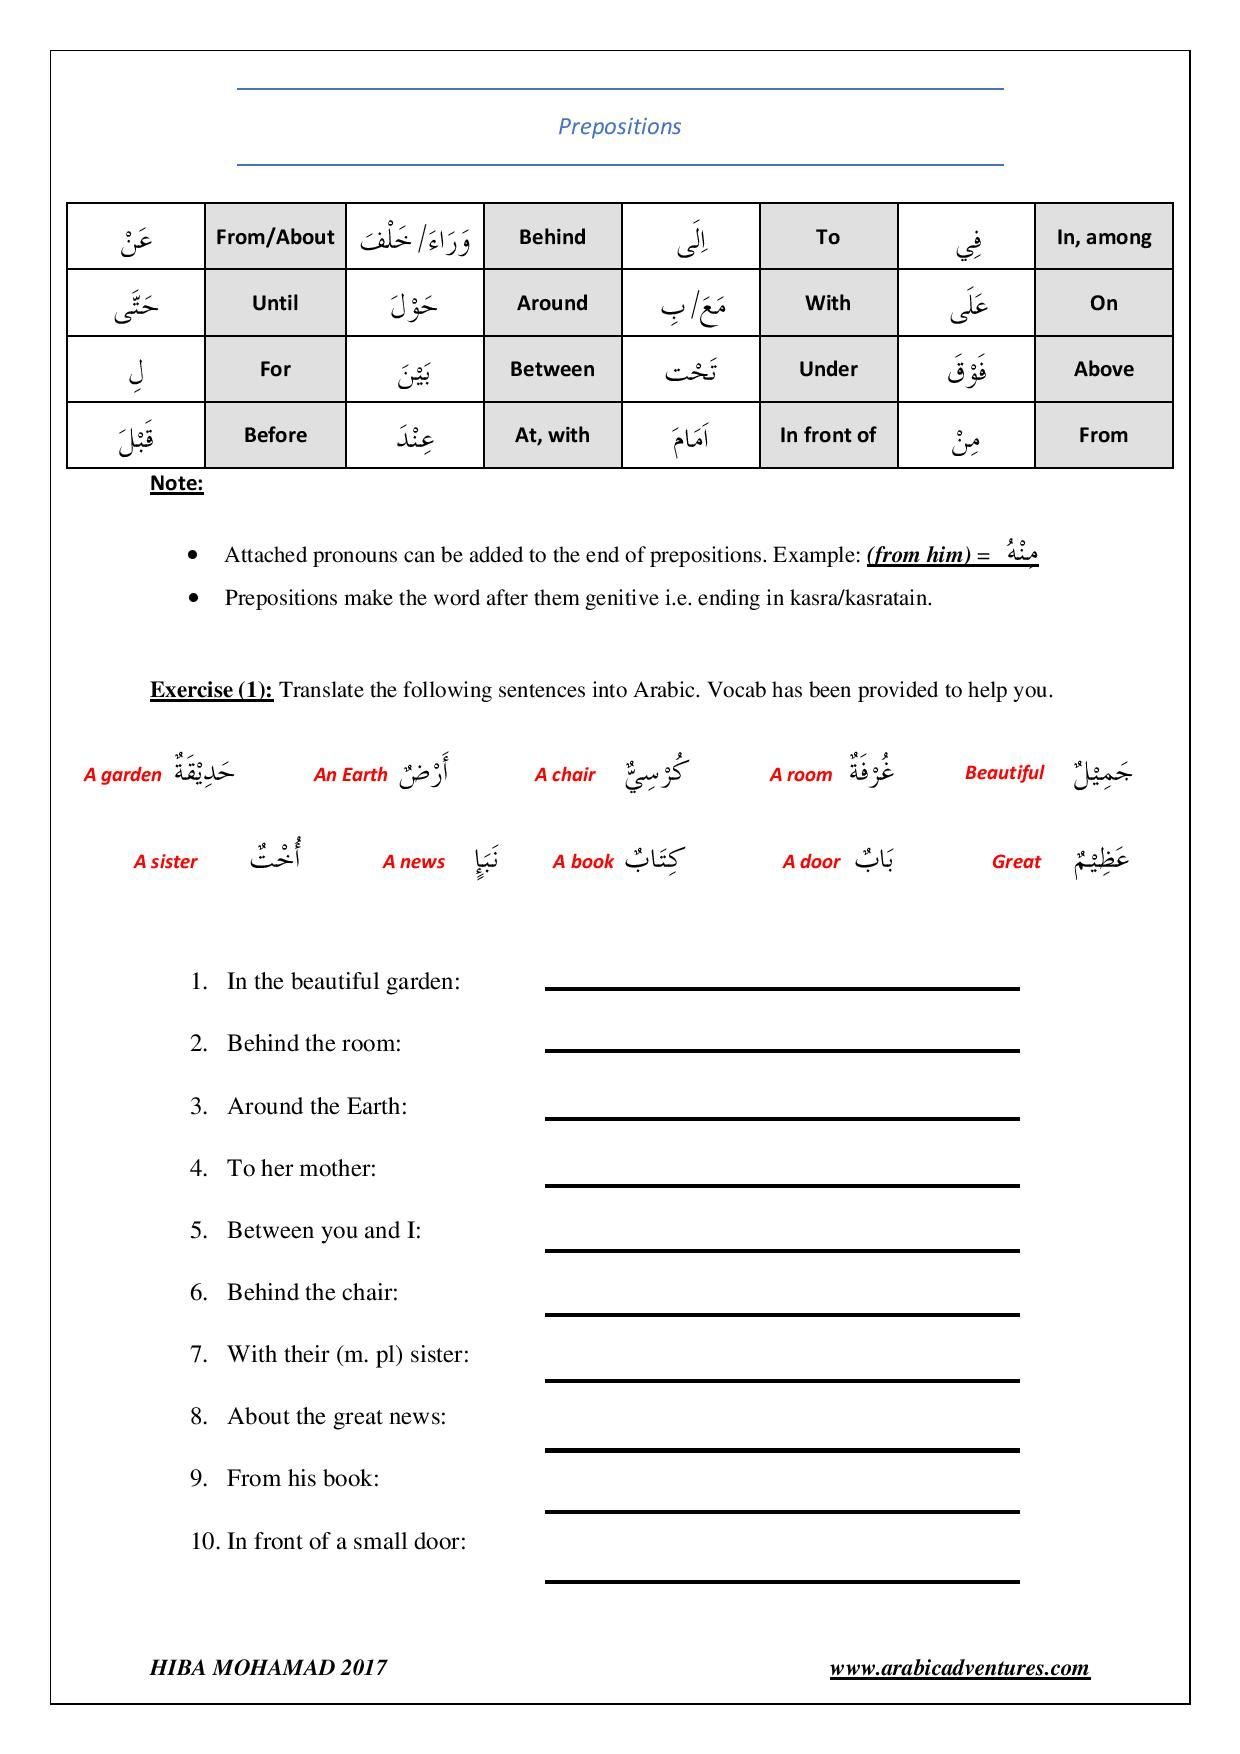 Prepositions worksheet www.arabicadventures.com   Grammar worksheets [ 1754 x 1240 Pixel ]